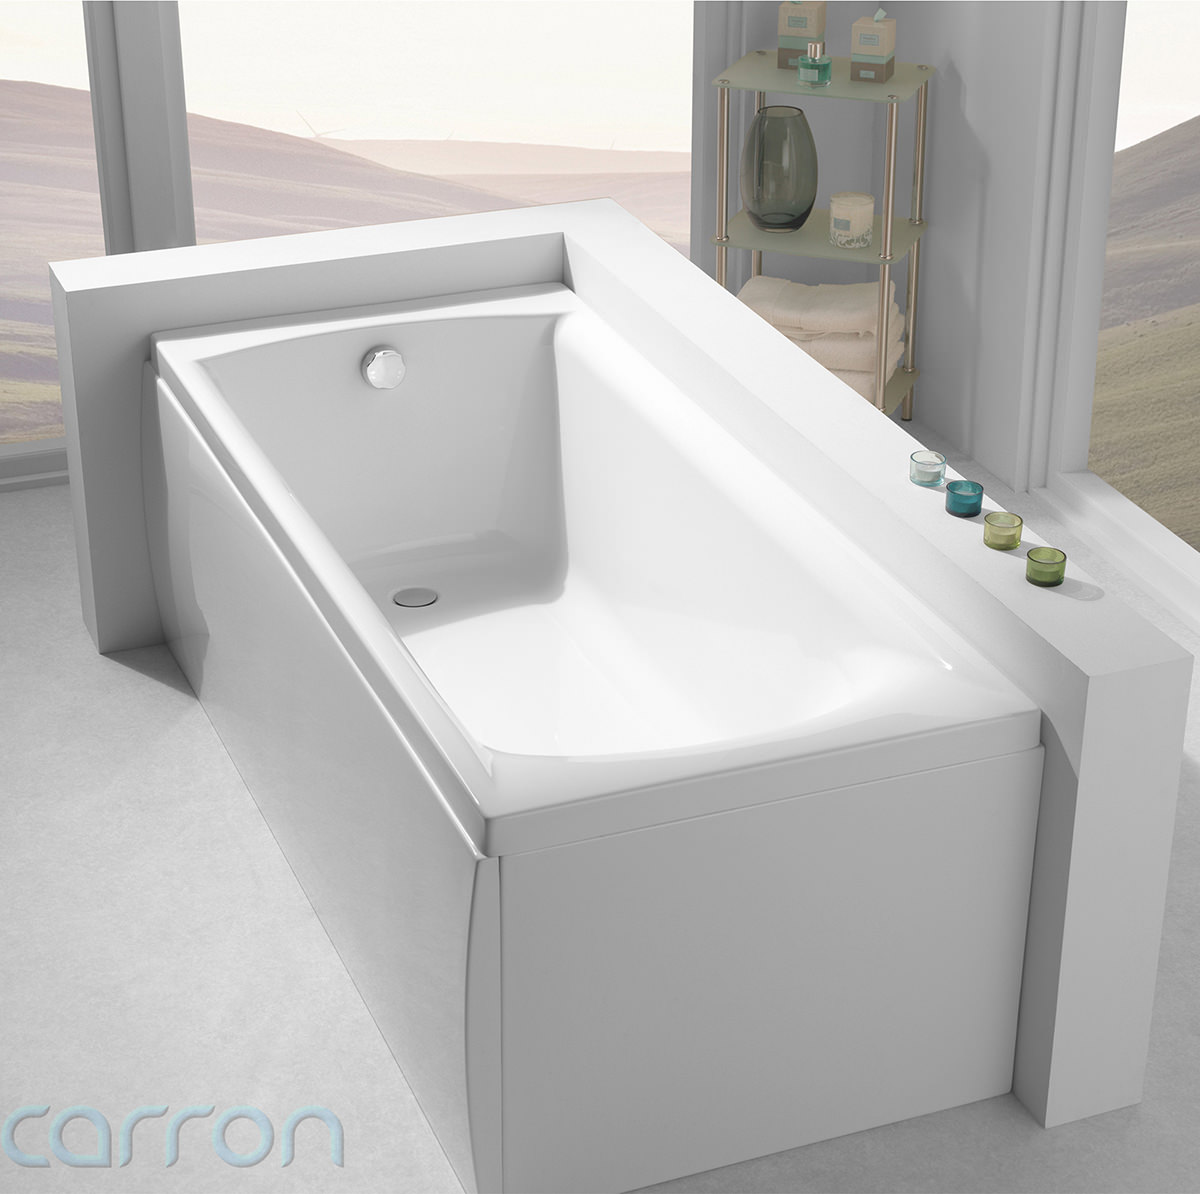 28 Shower Baths 1400 Carron Delta 1400 X 700mm Single Ended